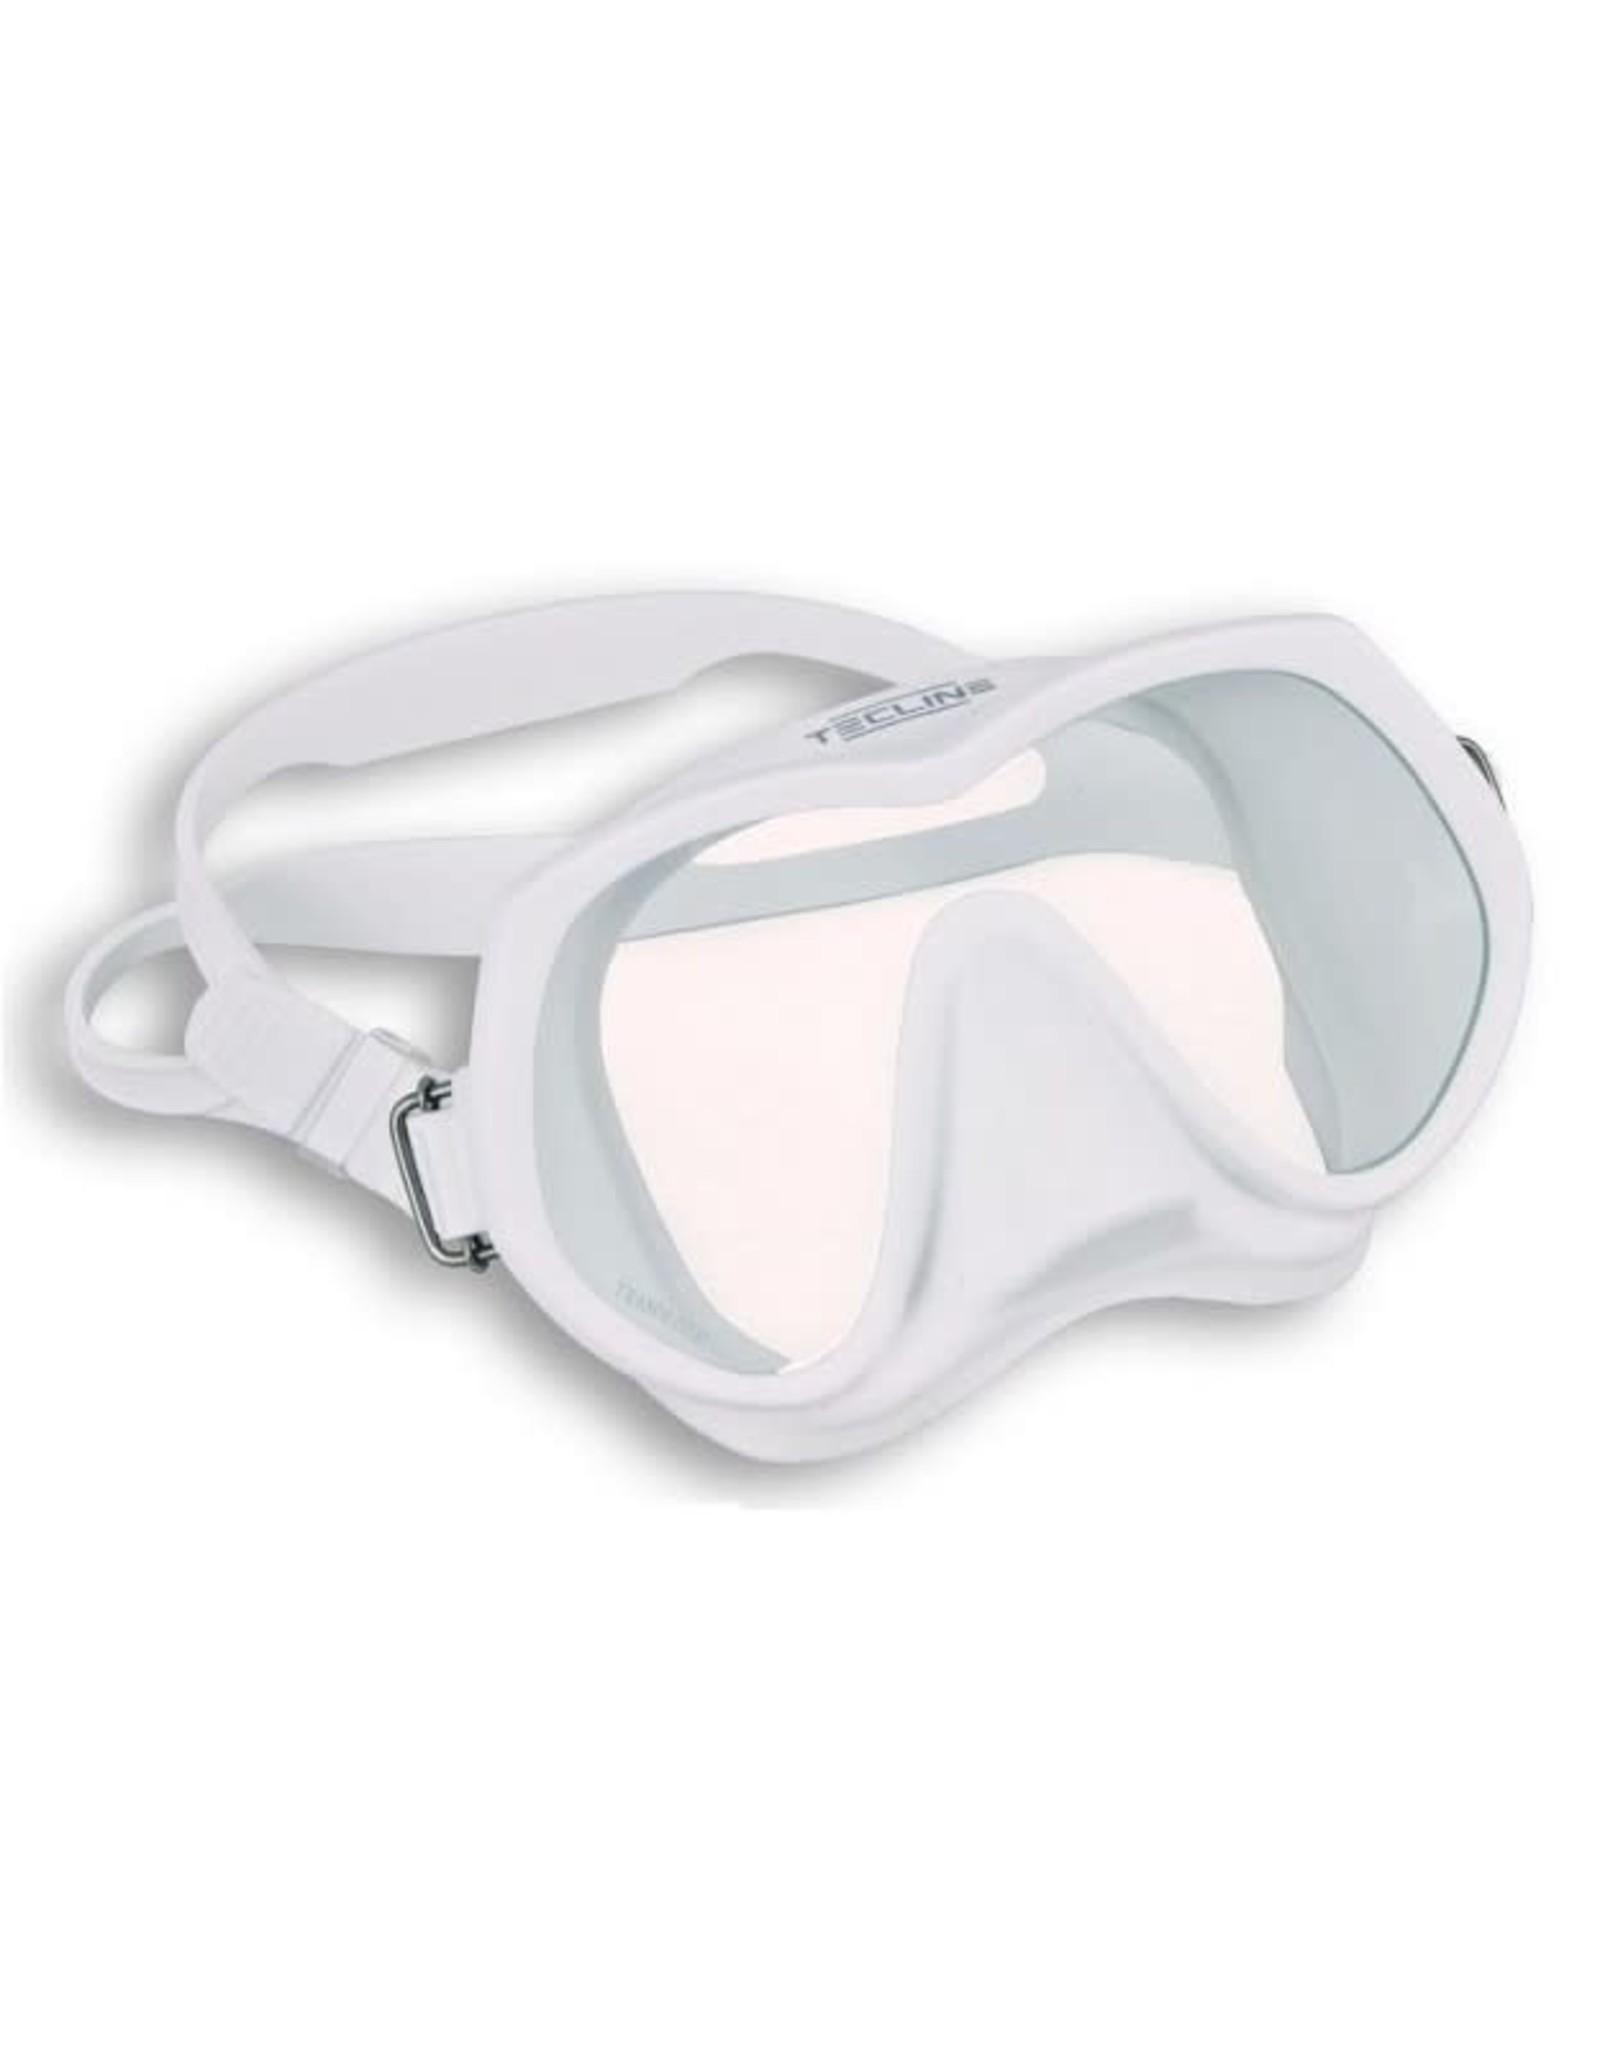 TecLine Tecline Frameless Super View masker - White